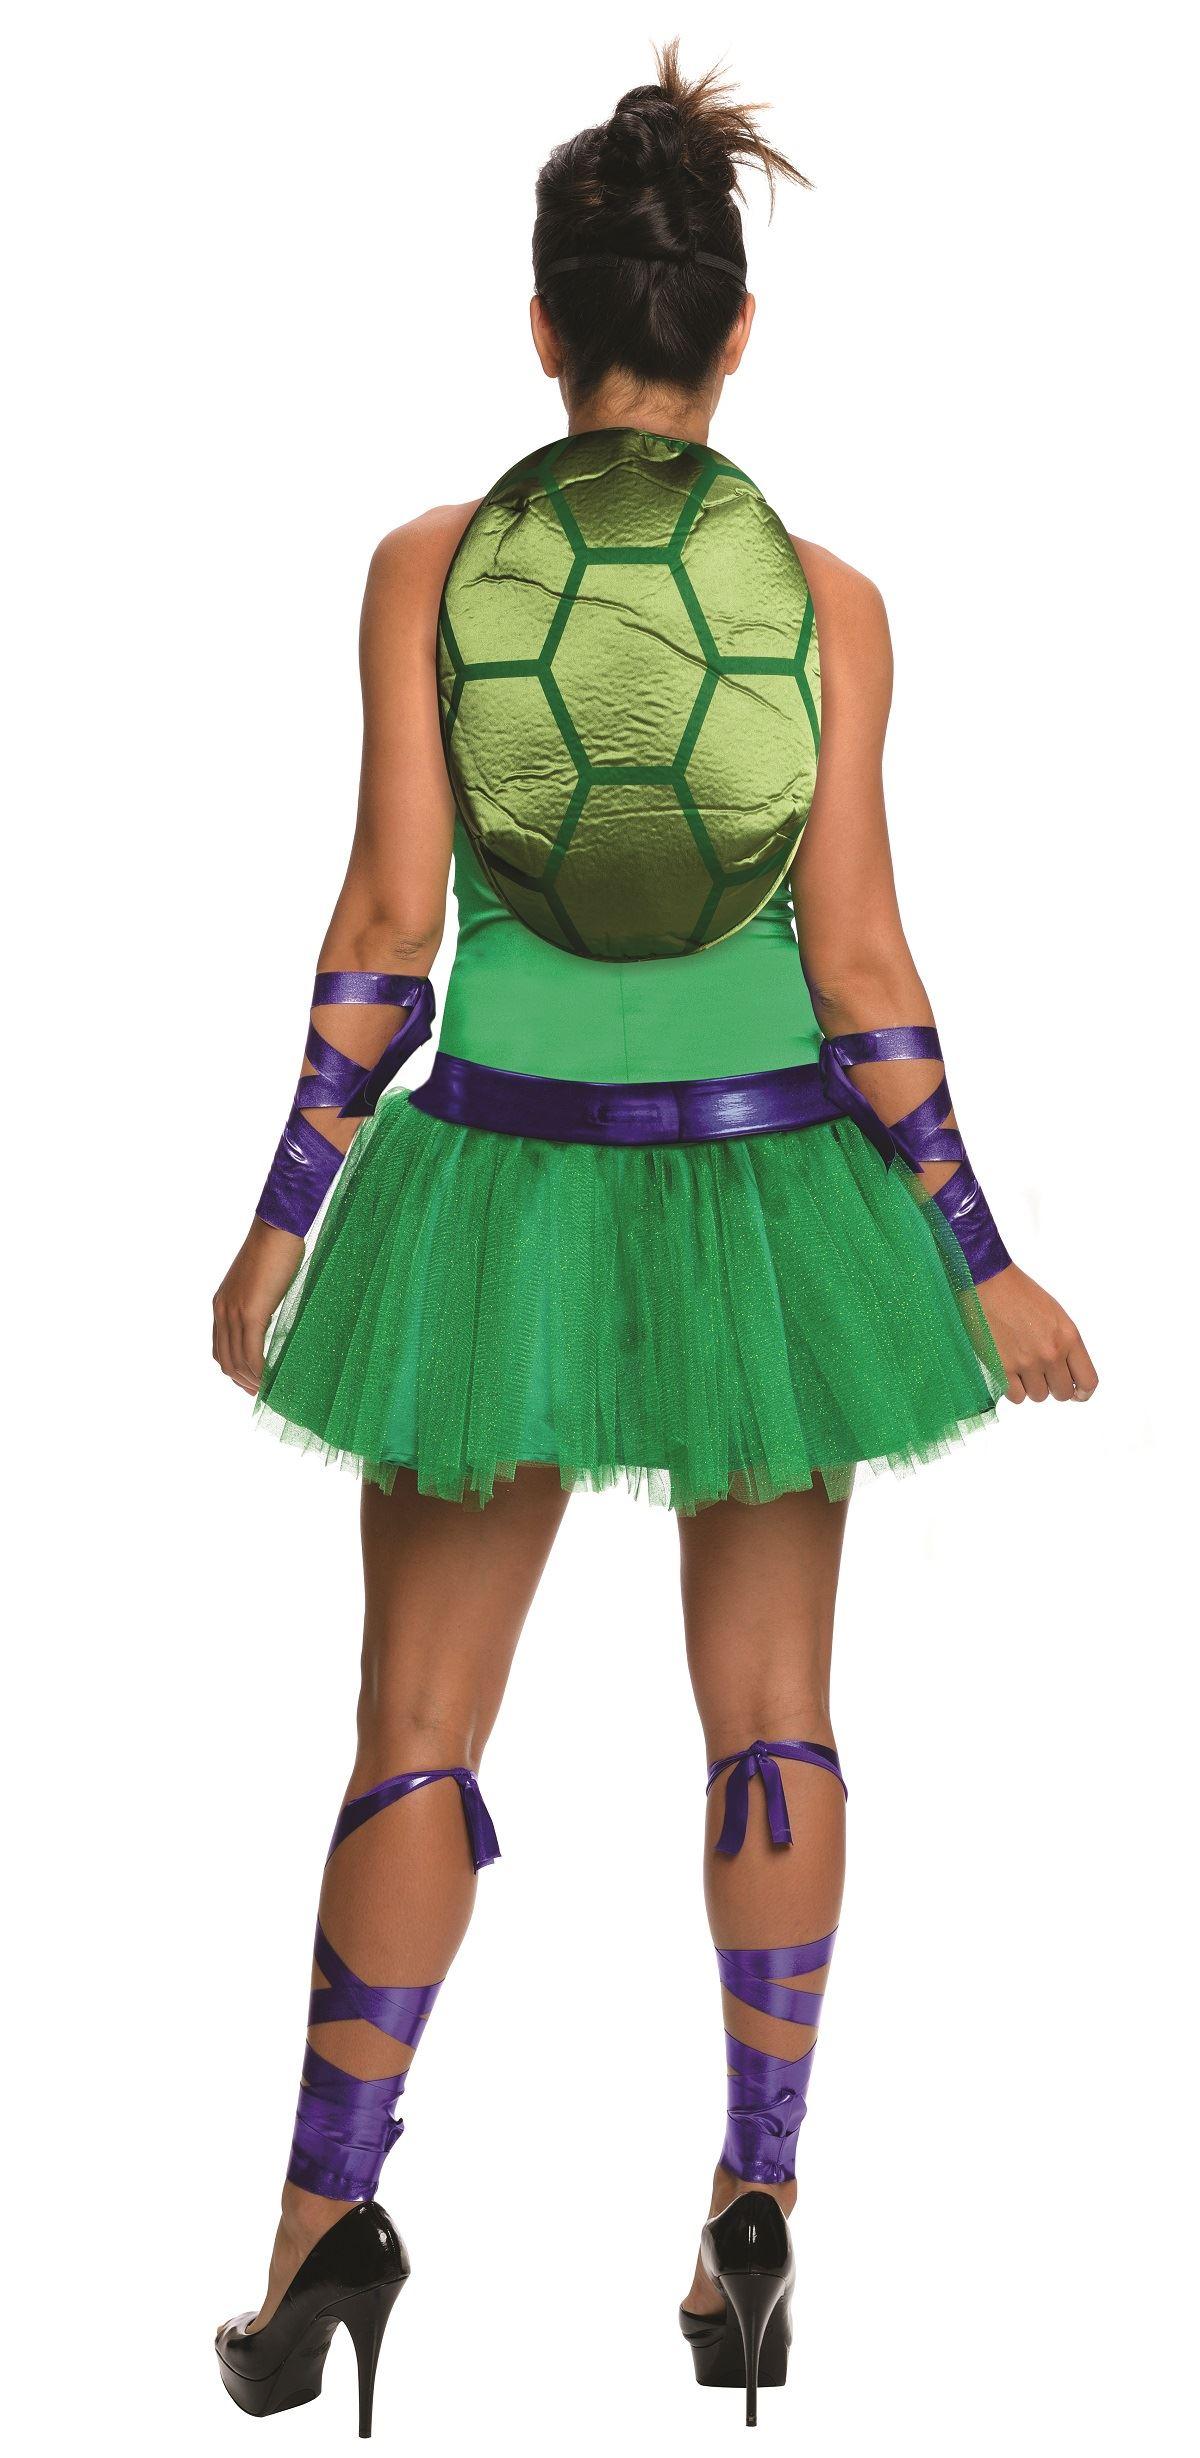 Adult Donatello Ninja Turtle Woman Costume 14 99 The Costume Land